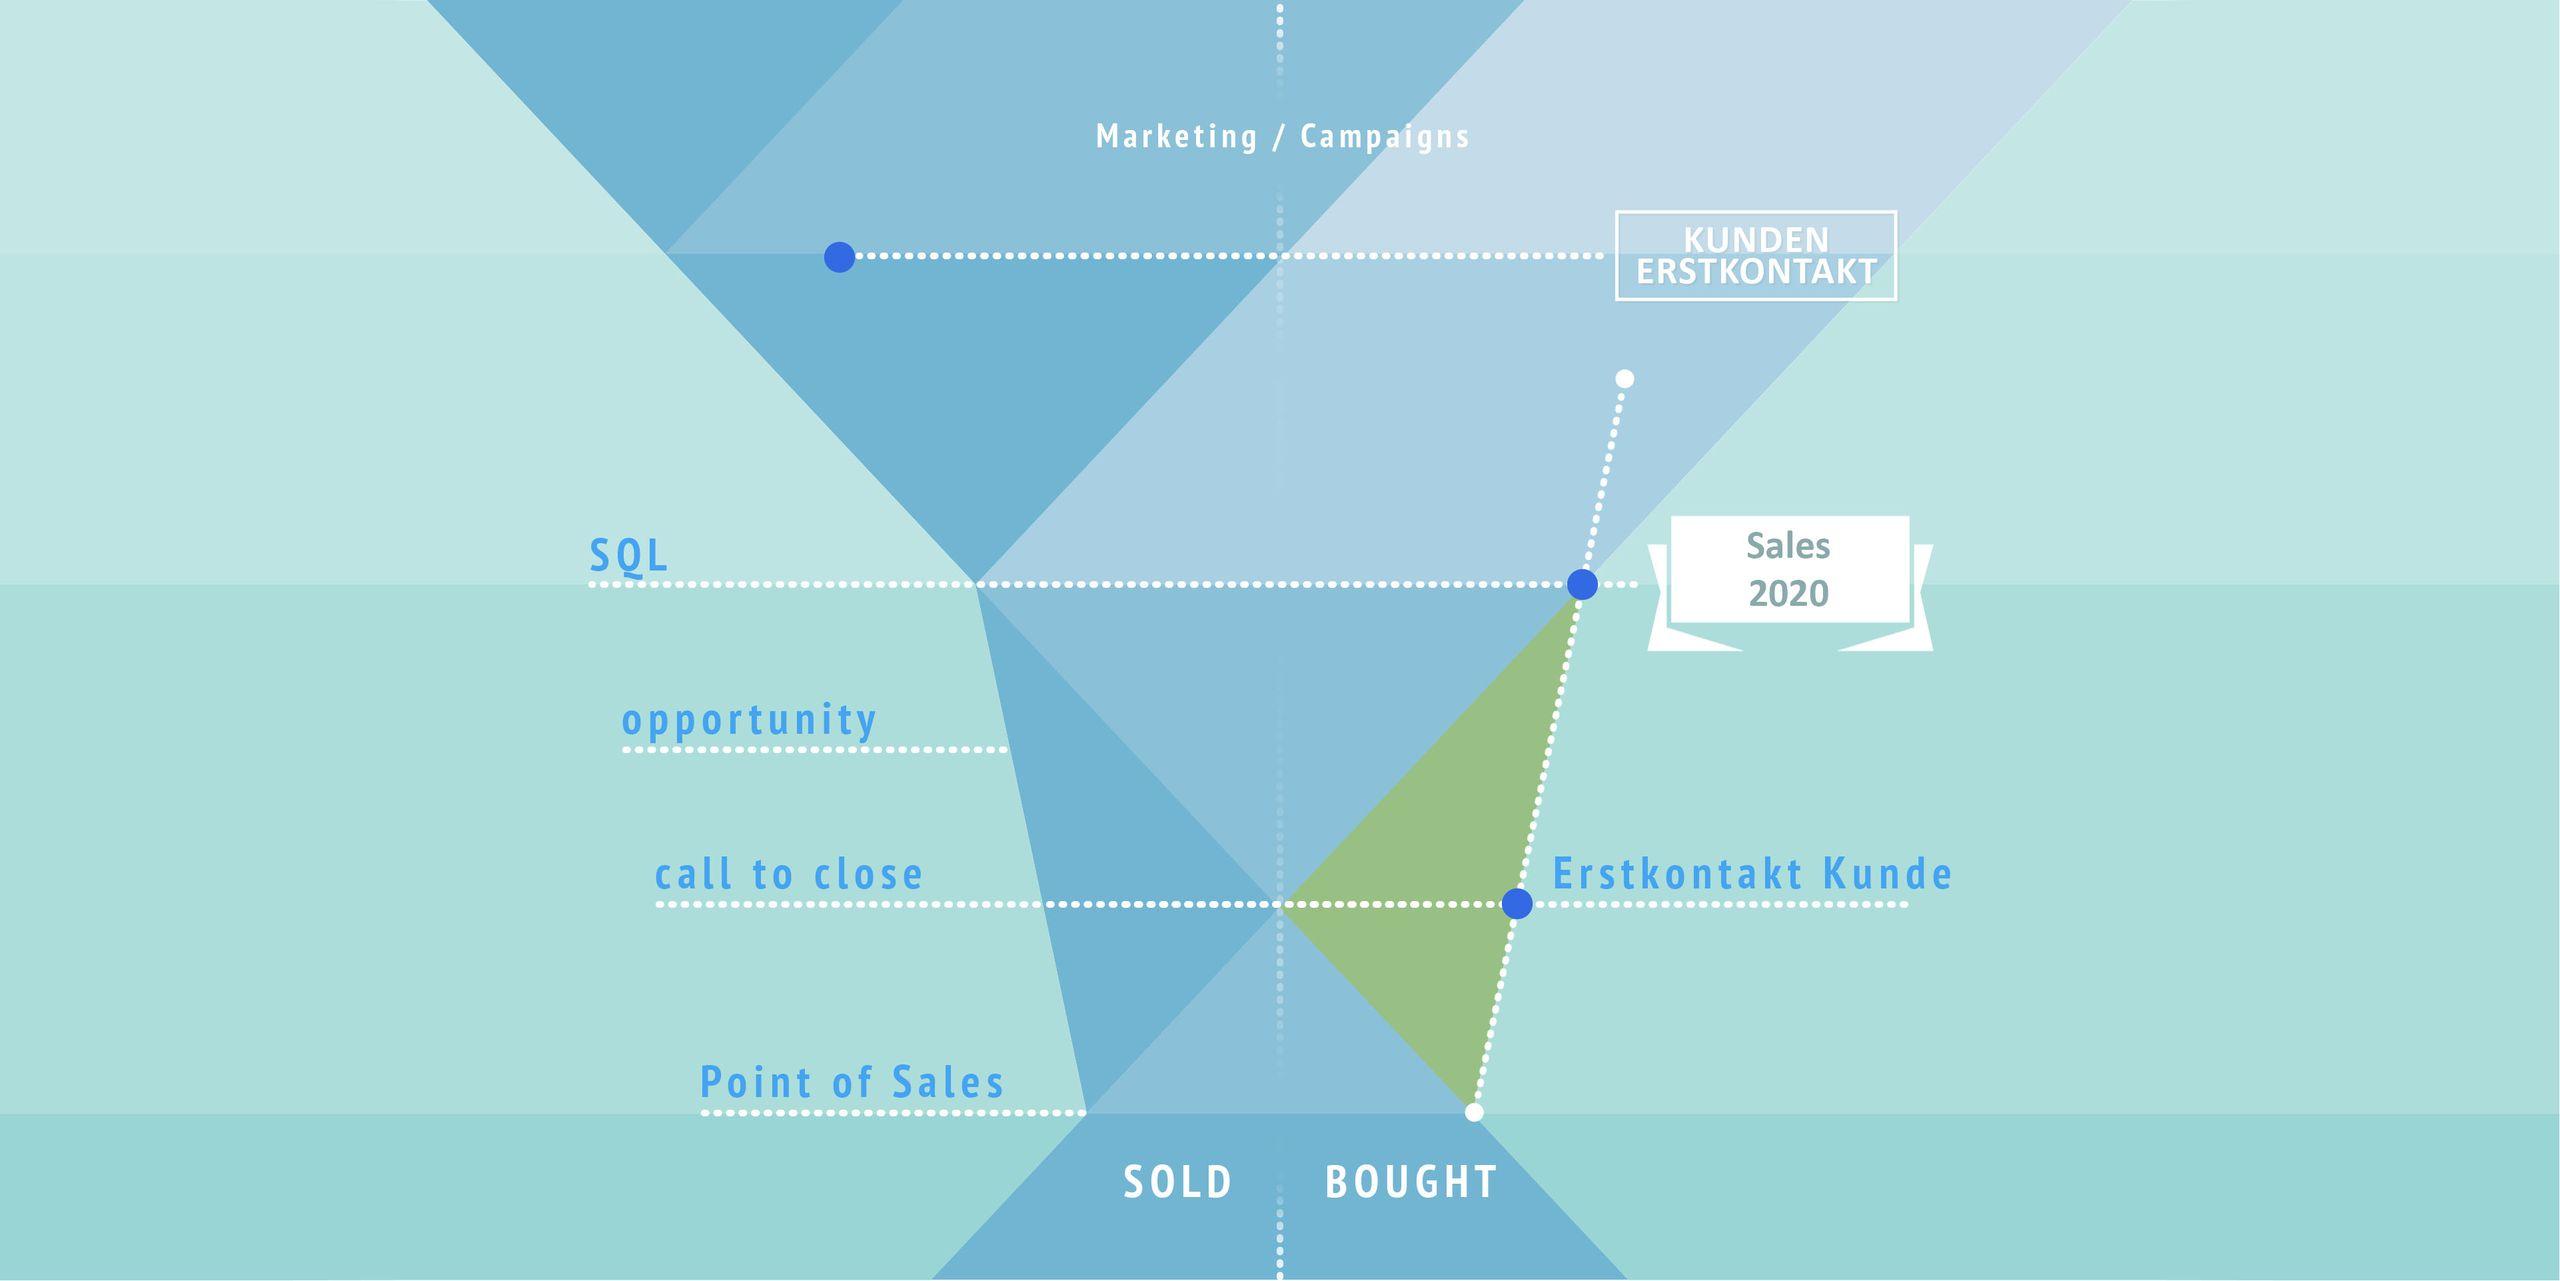 BM-Experts - Sales Funnel - Bought not sold - Die Digitalisierung des Vertriebs